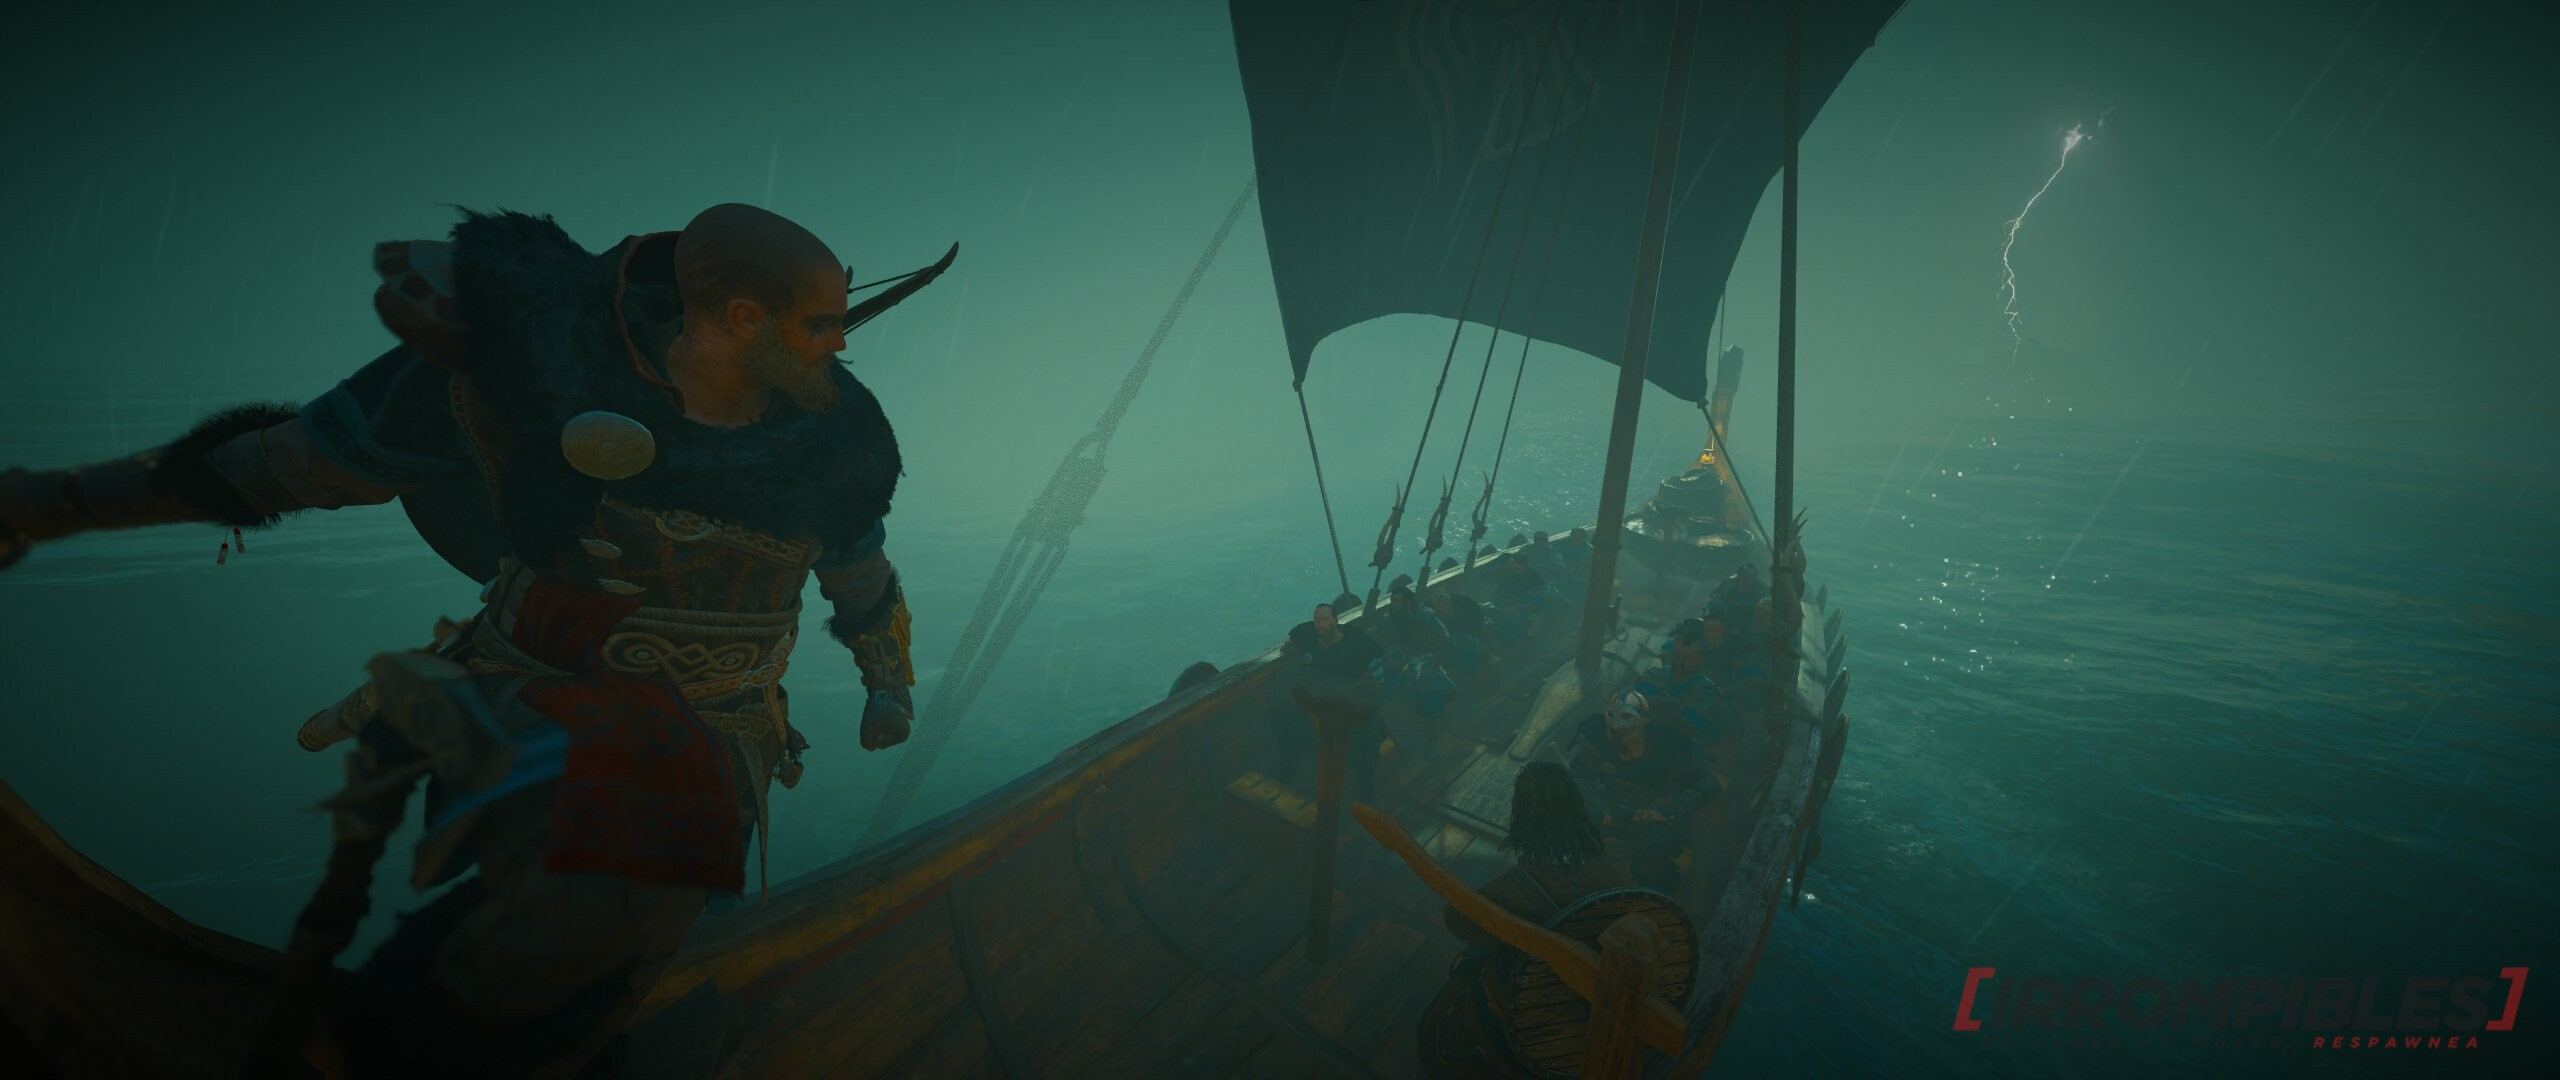 assassins creed valhalla barco